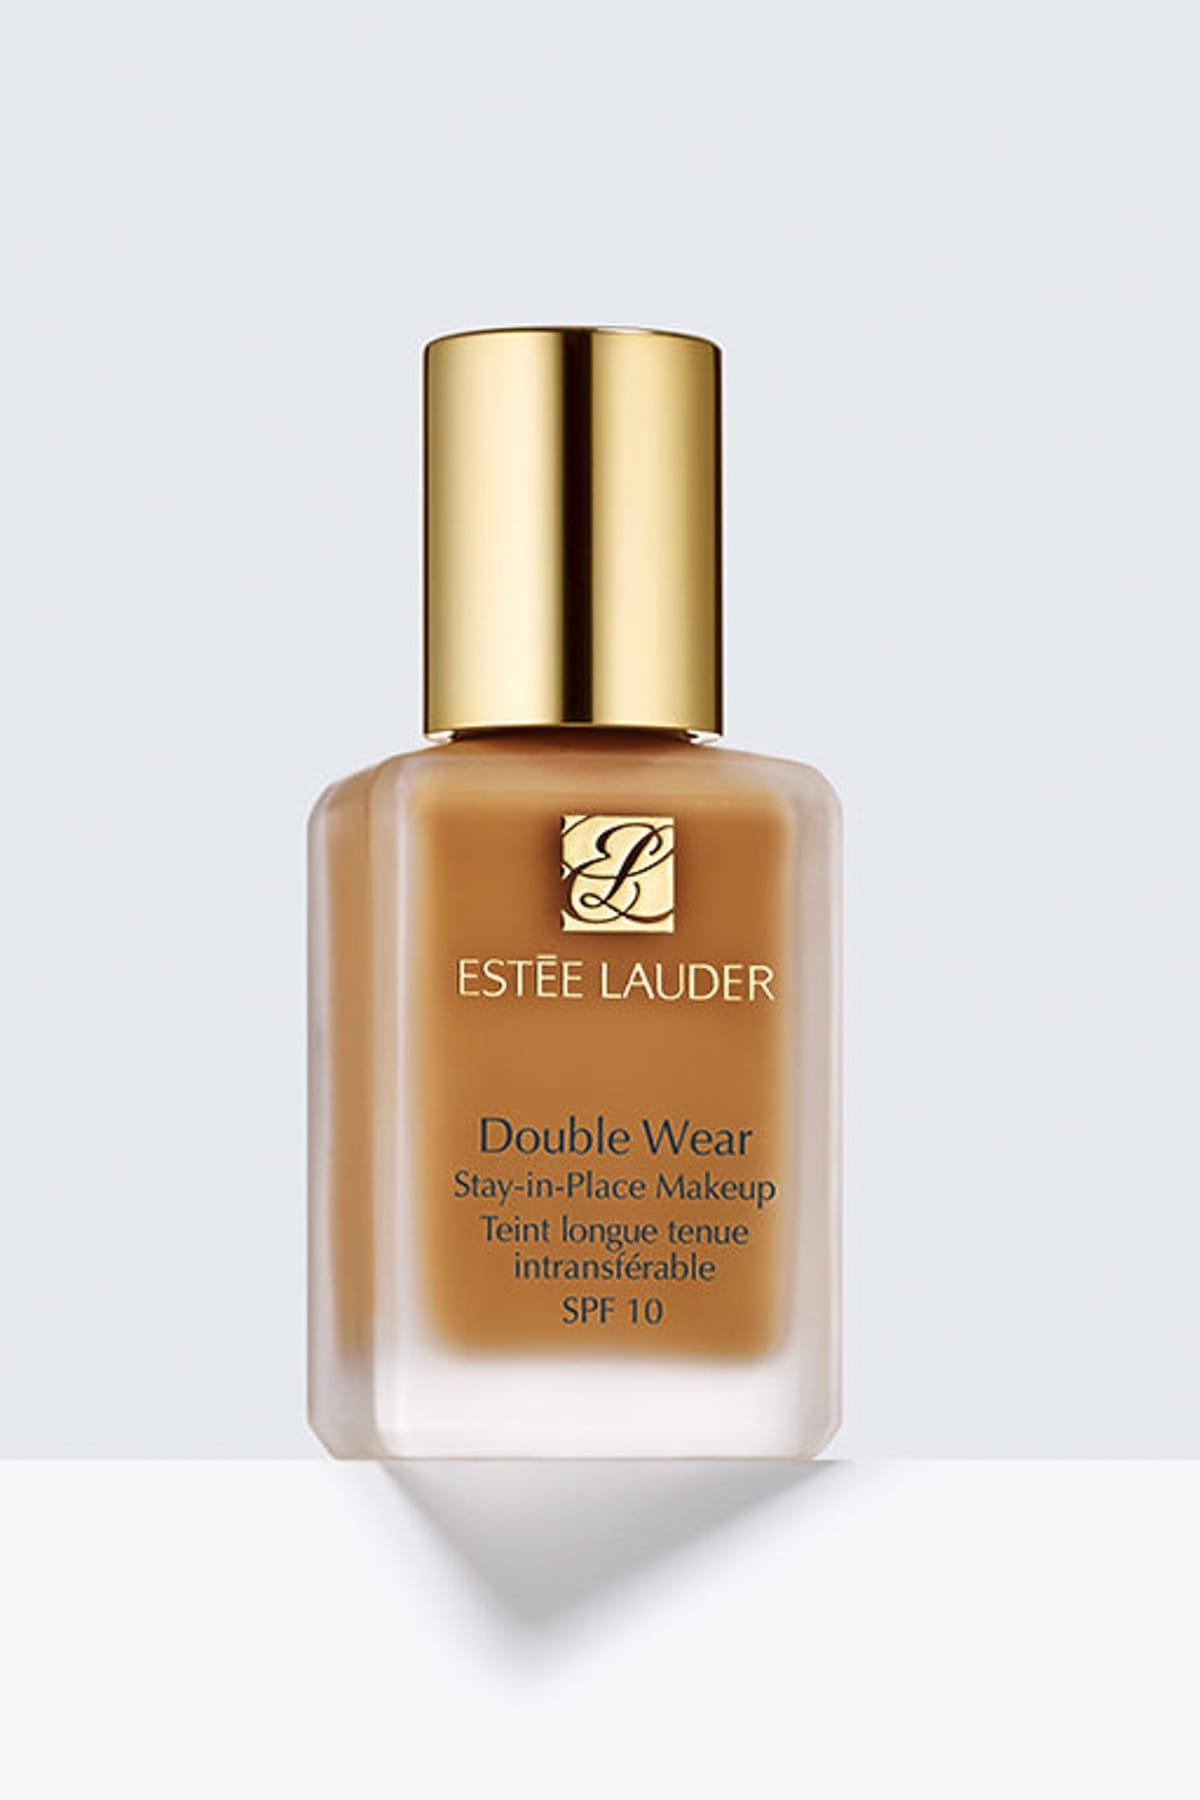 Estee Lauder Fondöten - Double Wear Foundation S.I.P Spf10 4W3 Henna 30 ml 027131659105 1